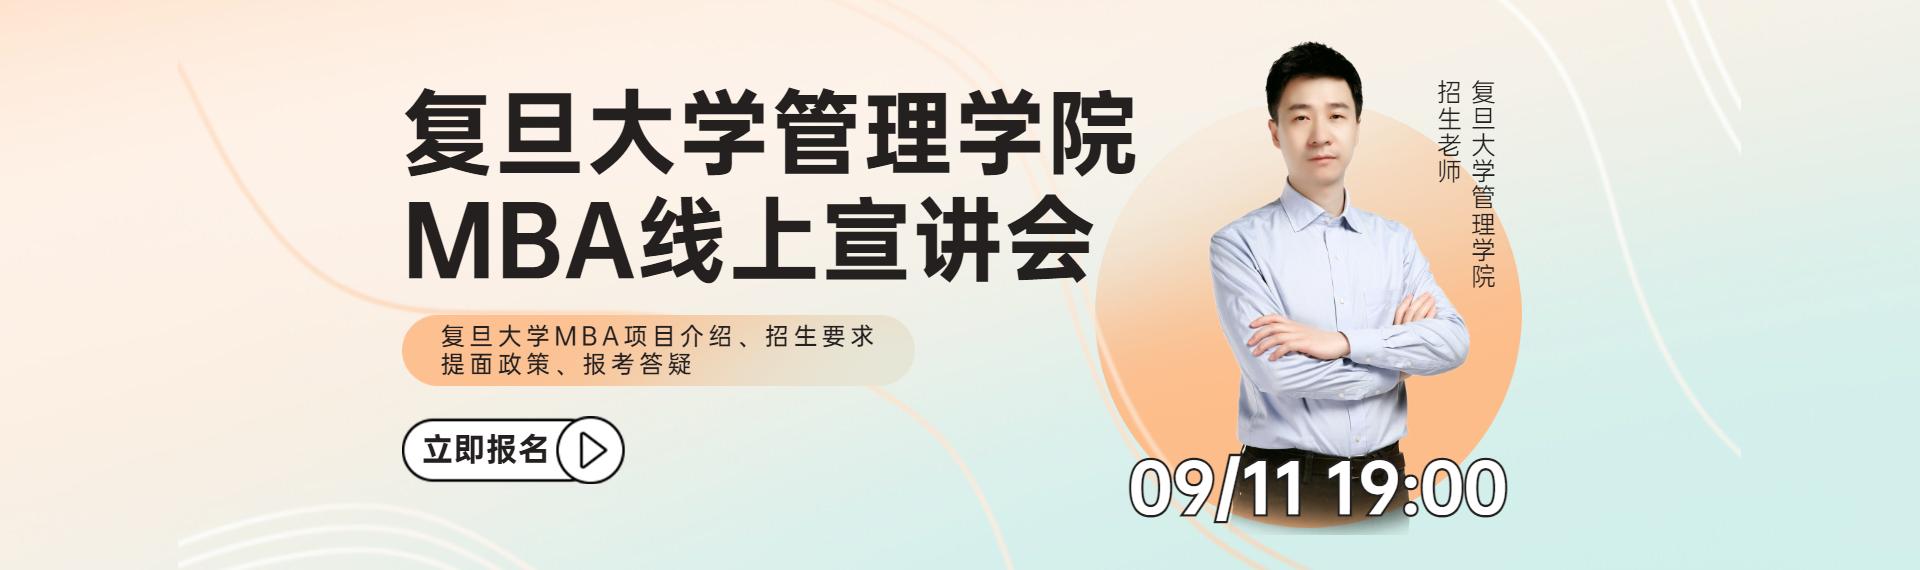 /uploads/image/2021/09/08/复旦宣讲.jpg